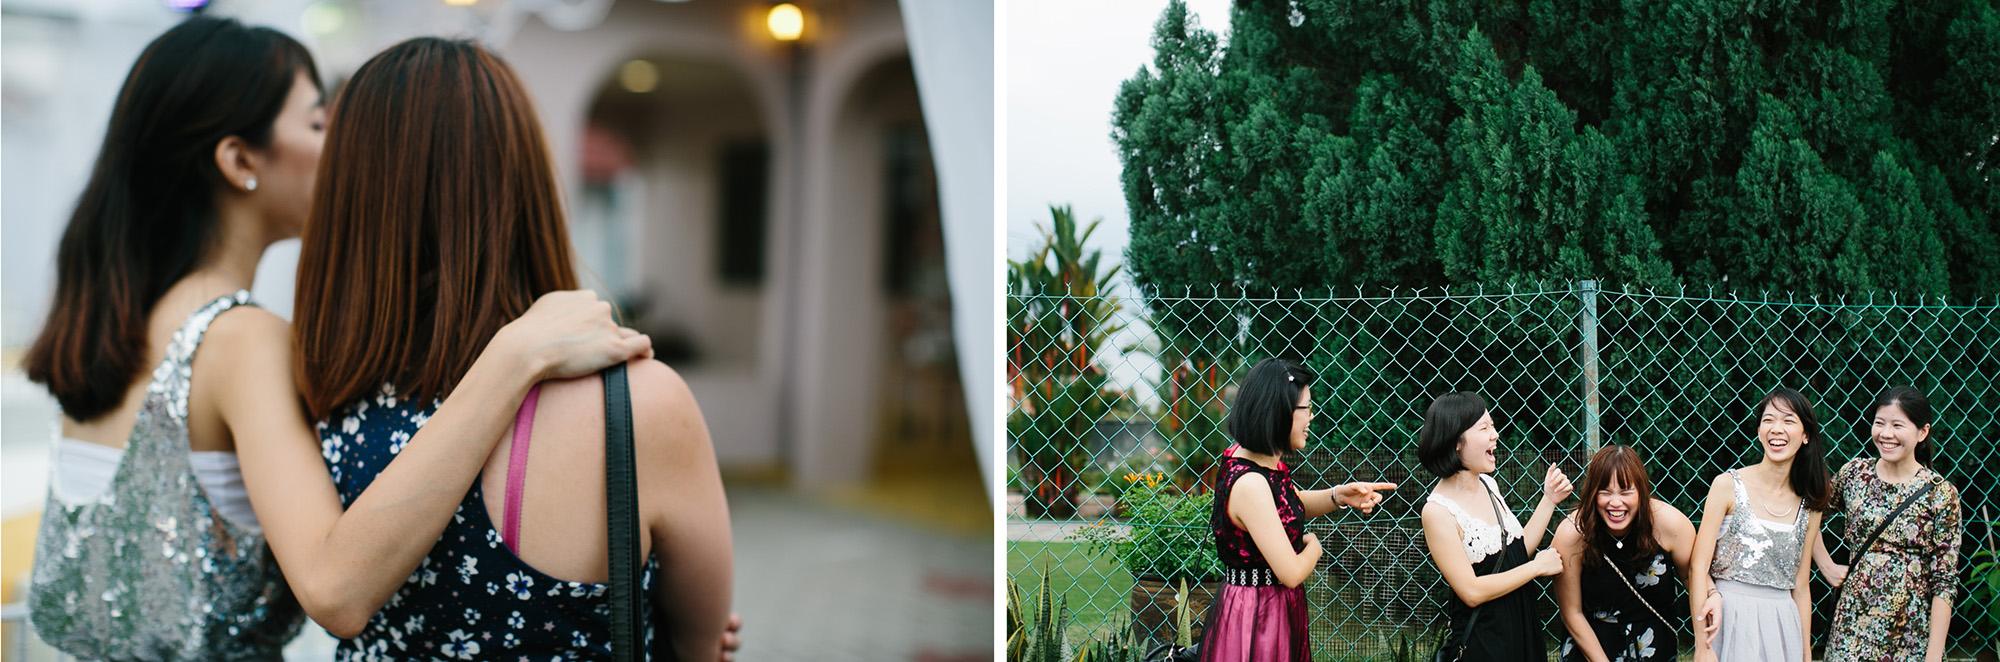 79-hellojanelee-sam grace-malaysia-wedding-day